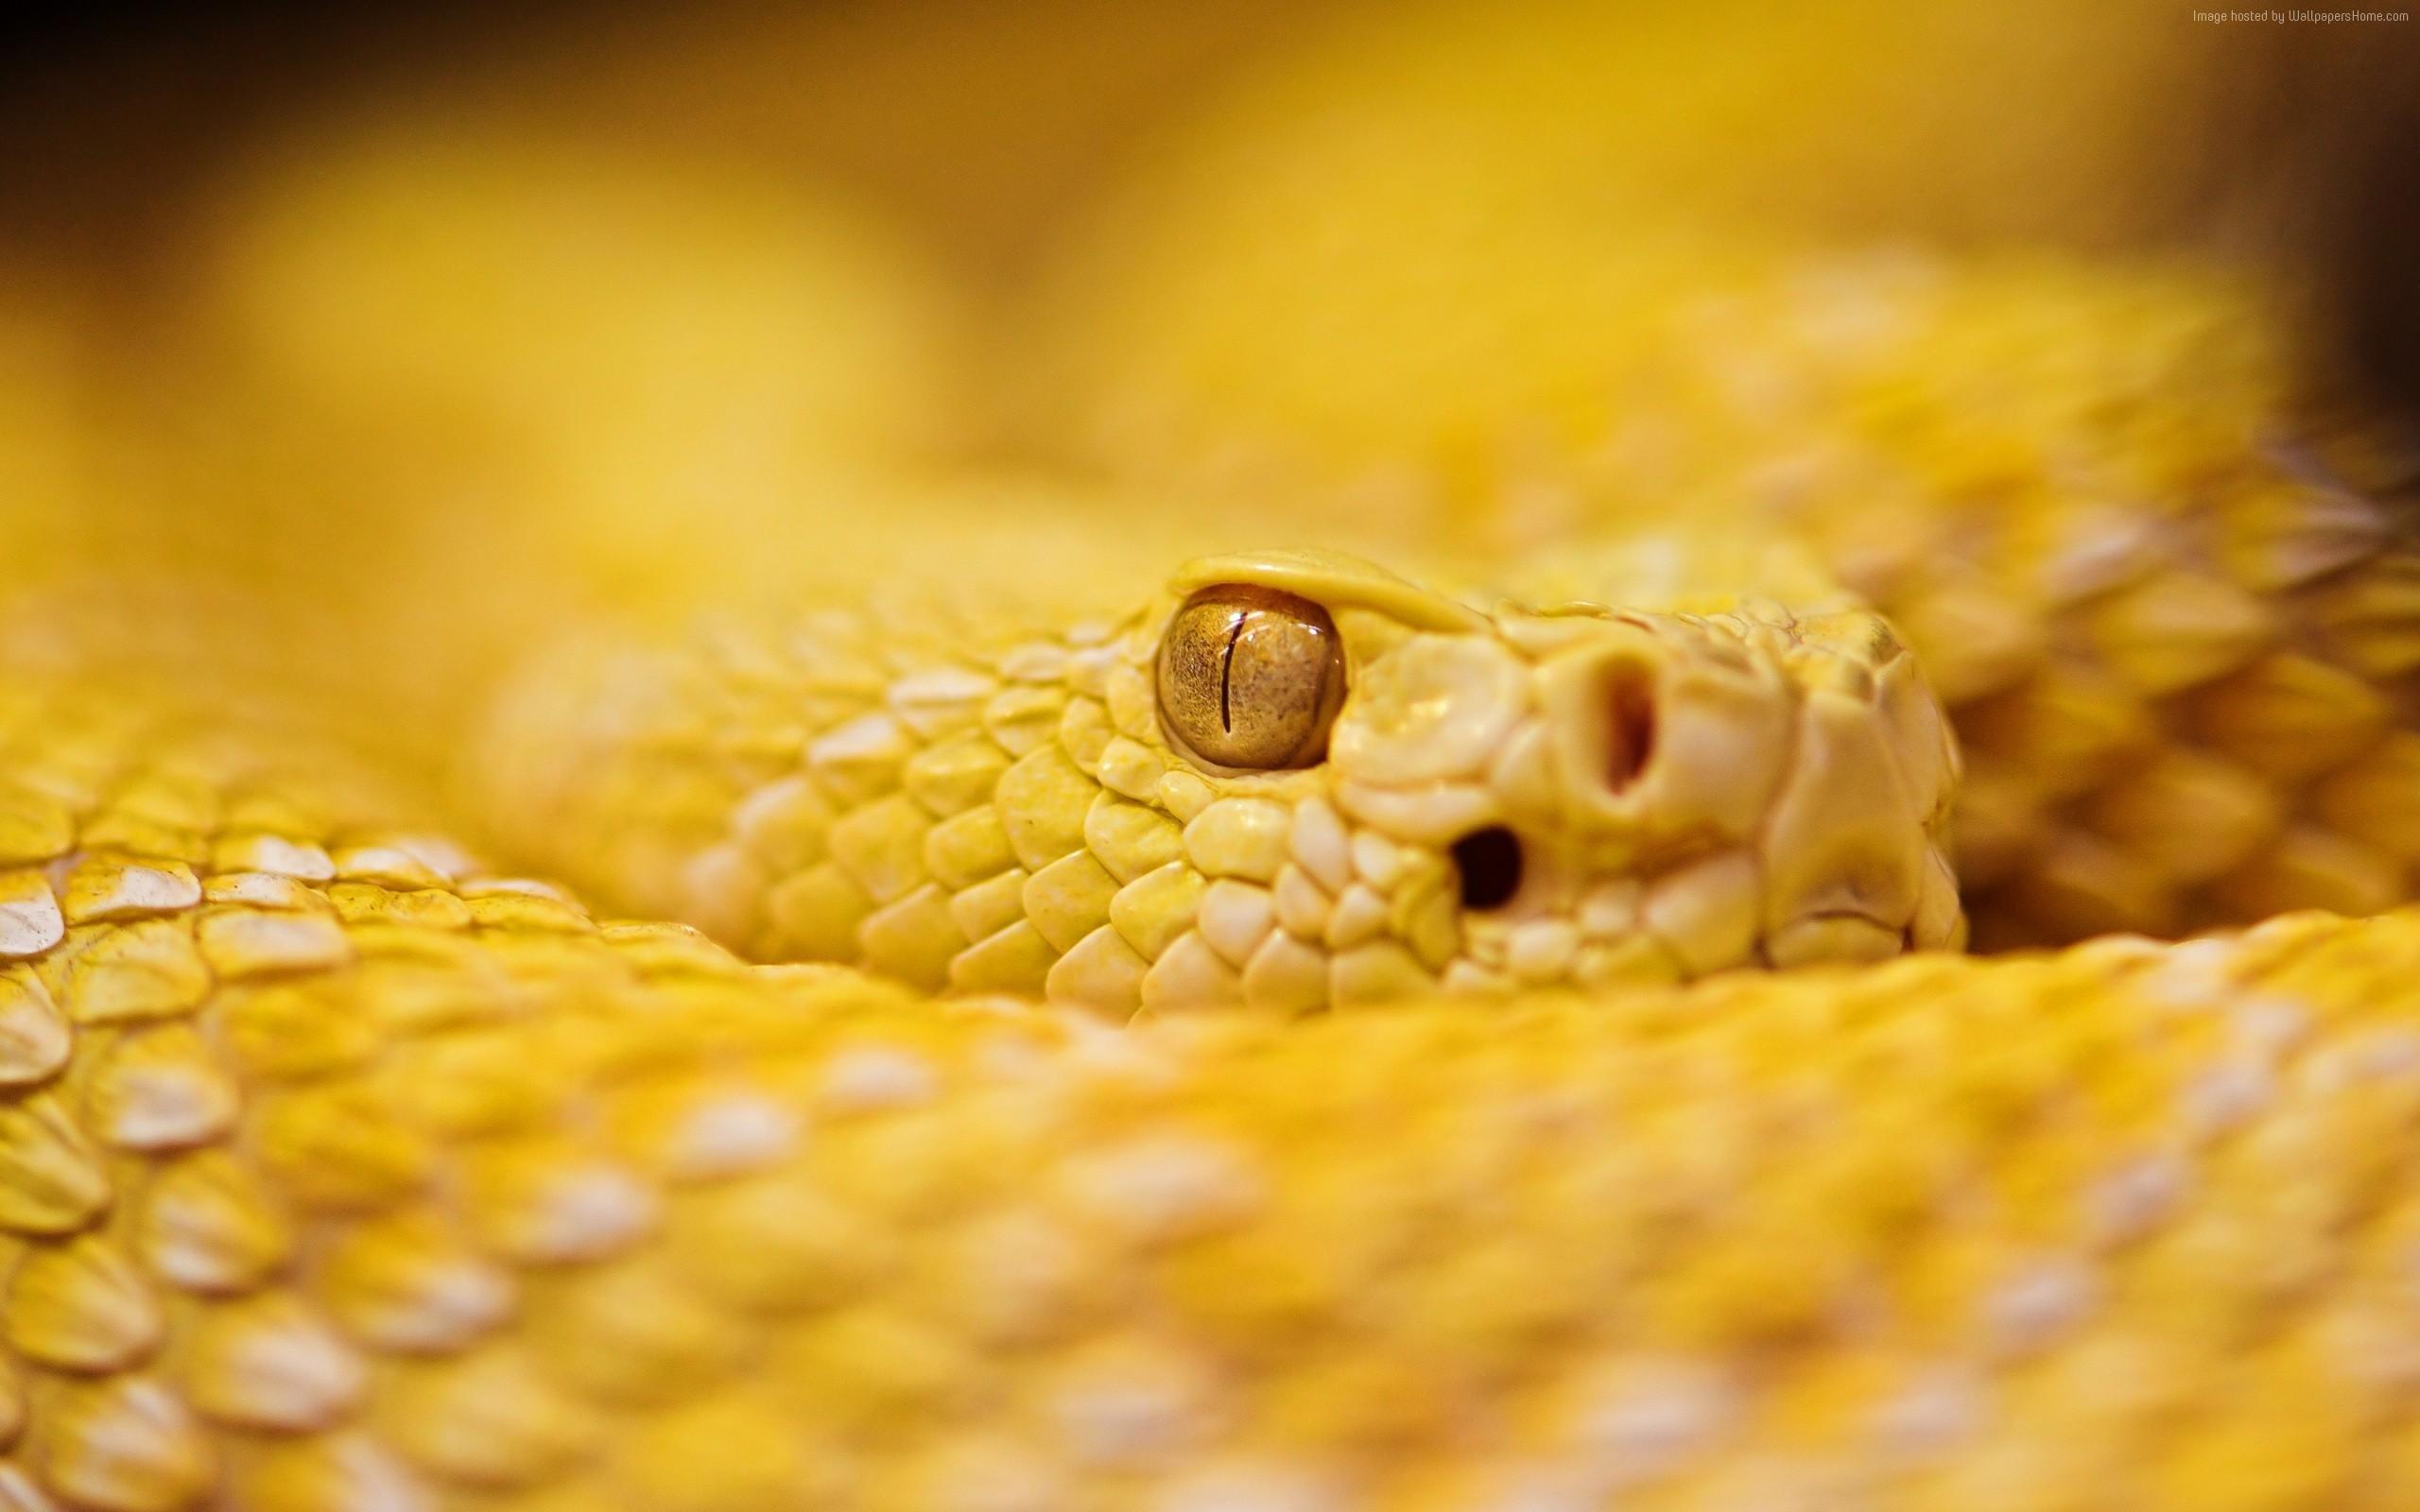 Res: 2560x1600, Wallpaper Snake, 4k, HD wallpaper, albino, rattlesnake, yellow, Eyes,  reptiles, OS #1028. Taking an 4k images, freezing a moment,